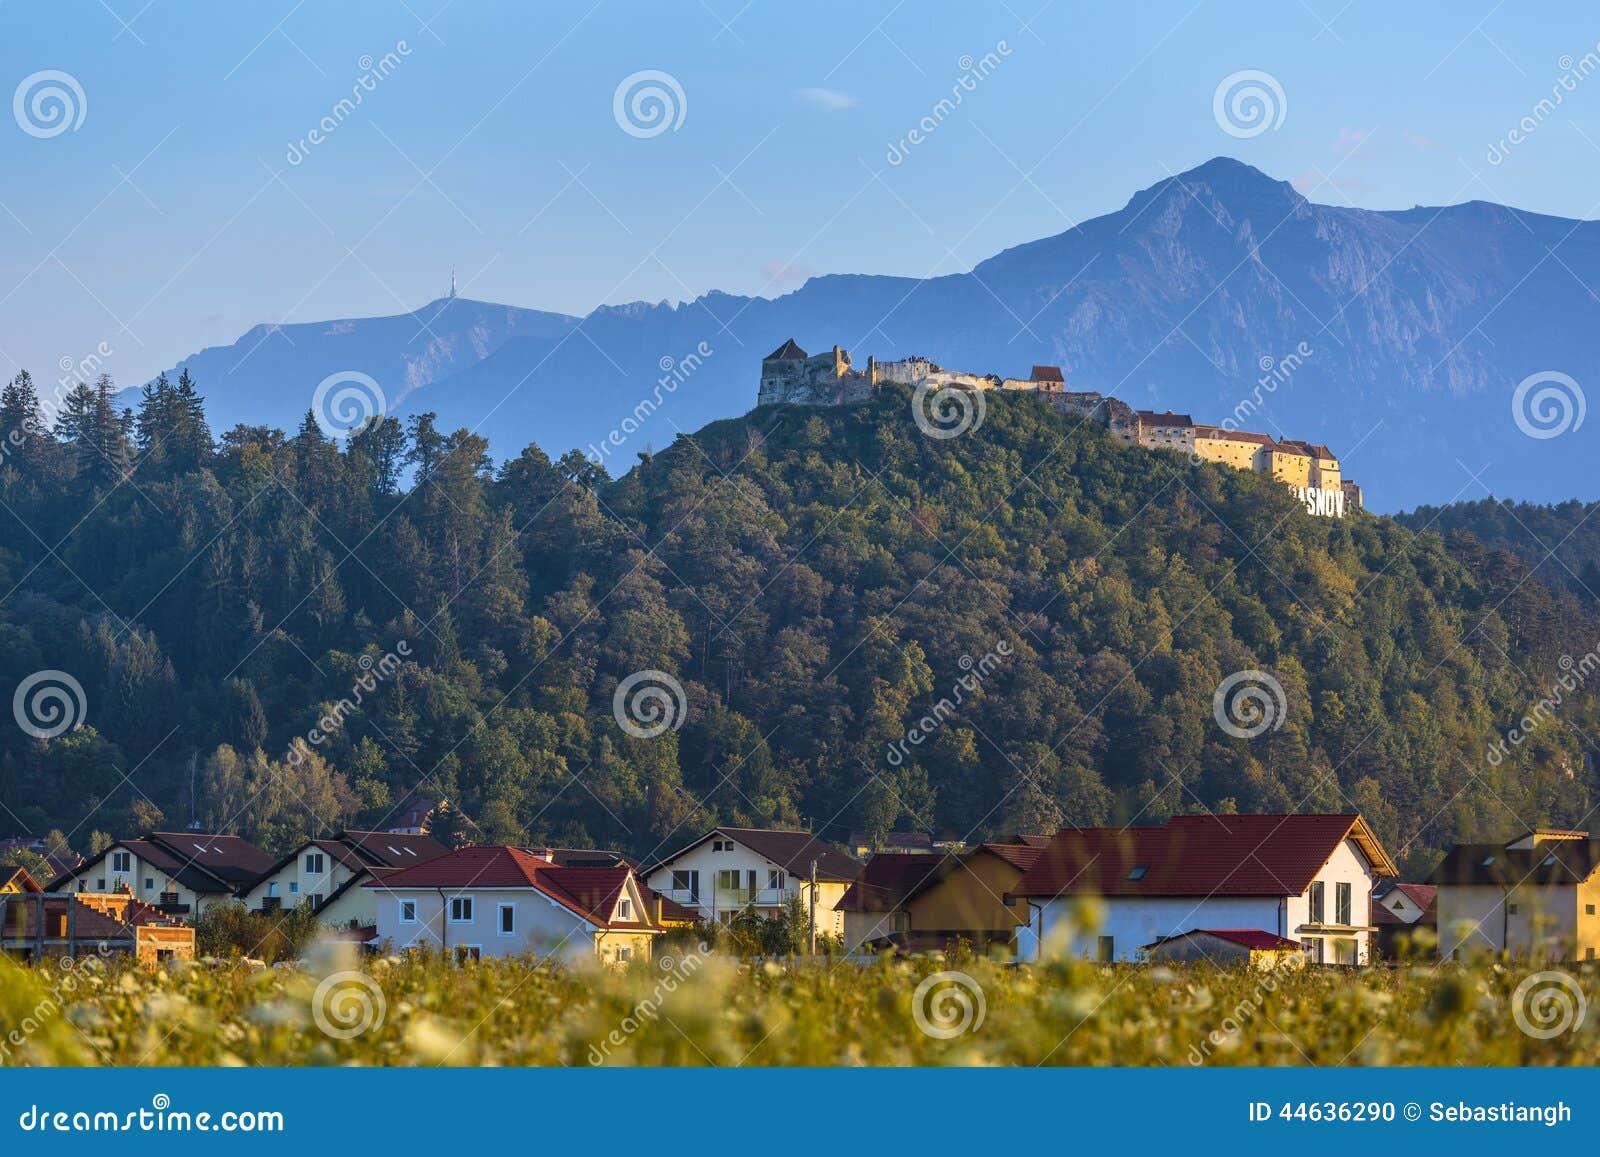 Fortaleza de Rasnov y montañas de Bucegi, Rumania